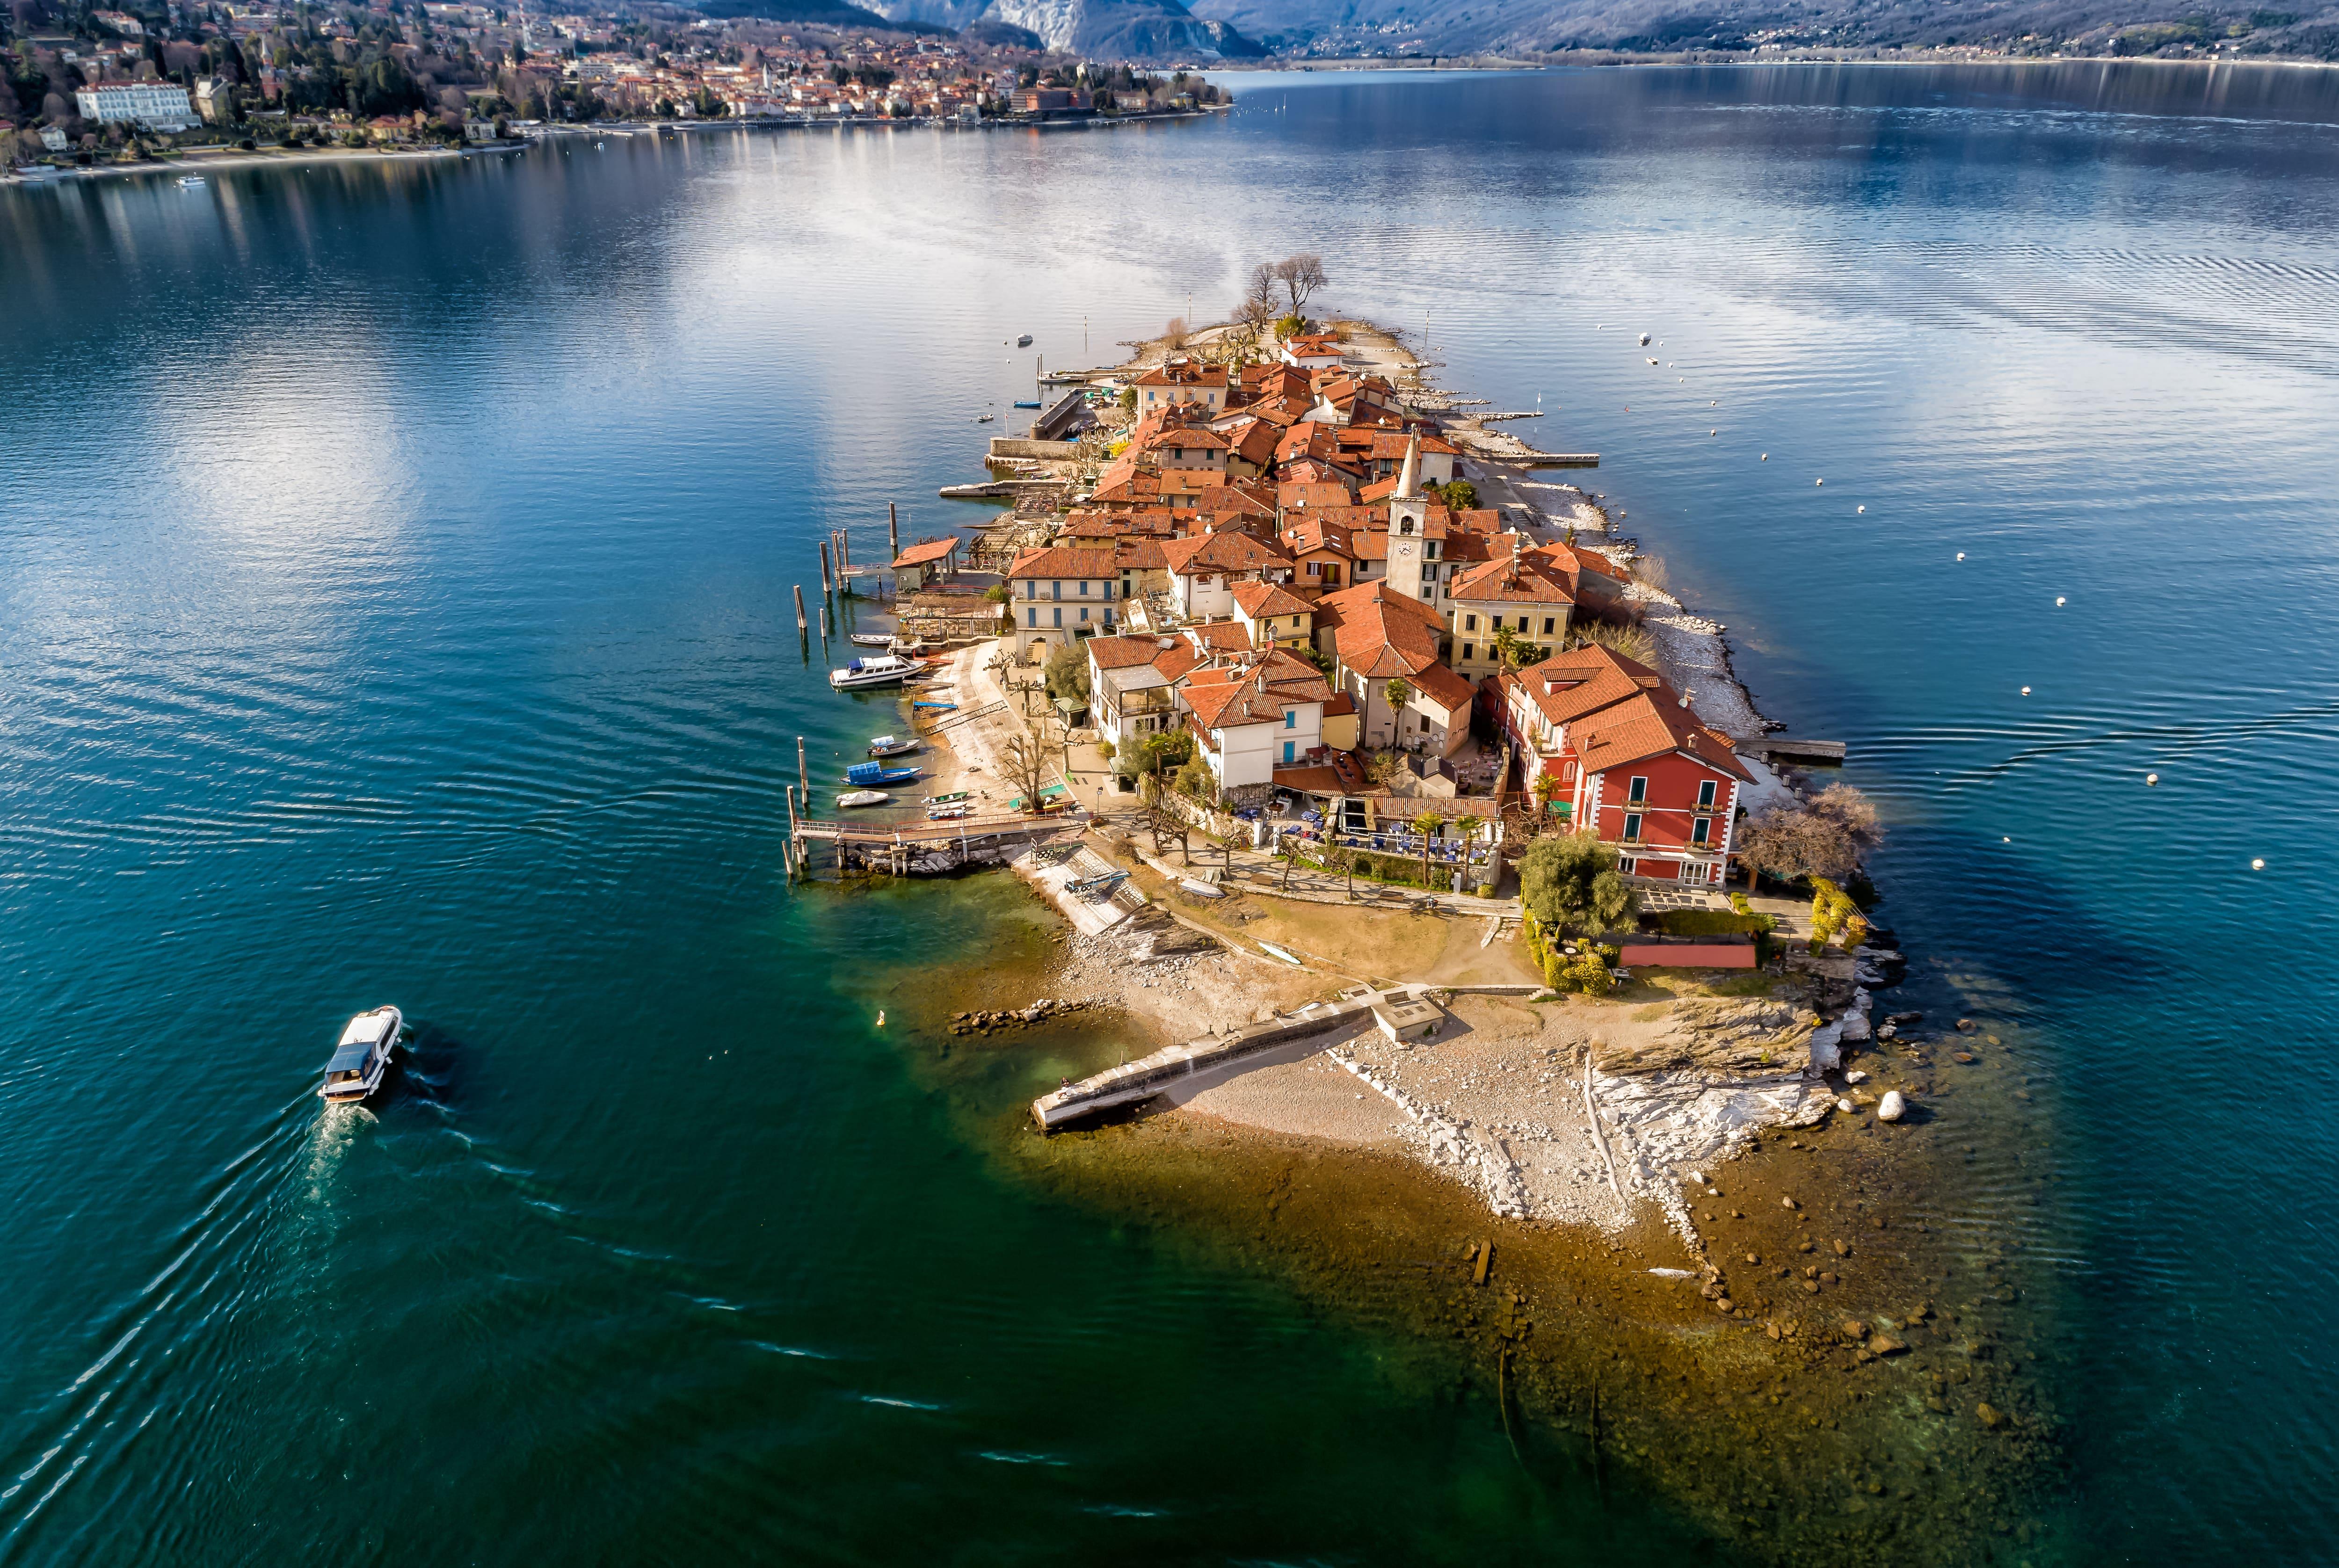 Aerial view of Isola dei Pescatori